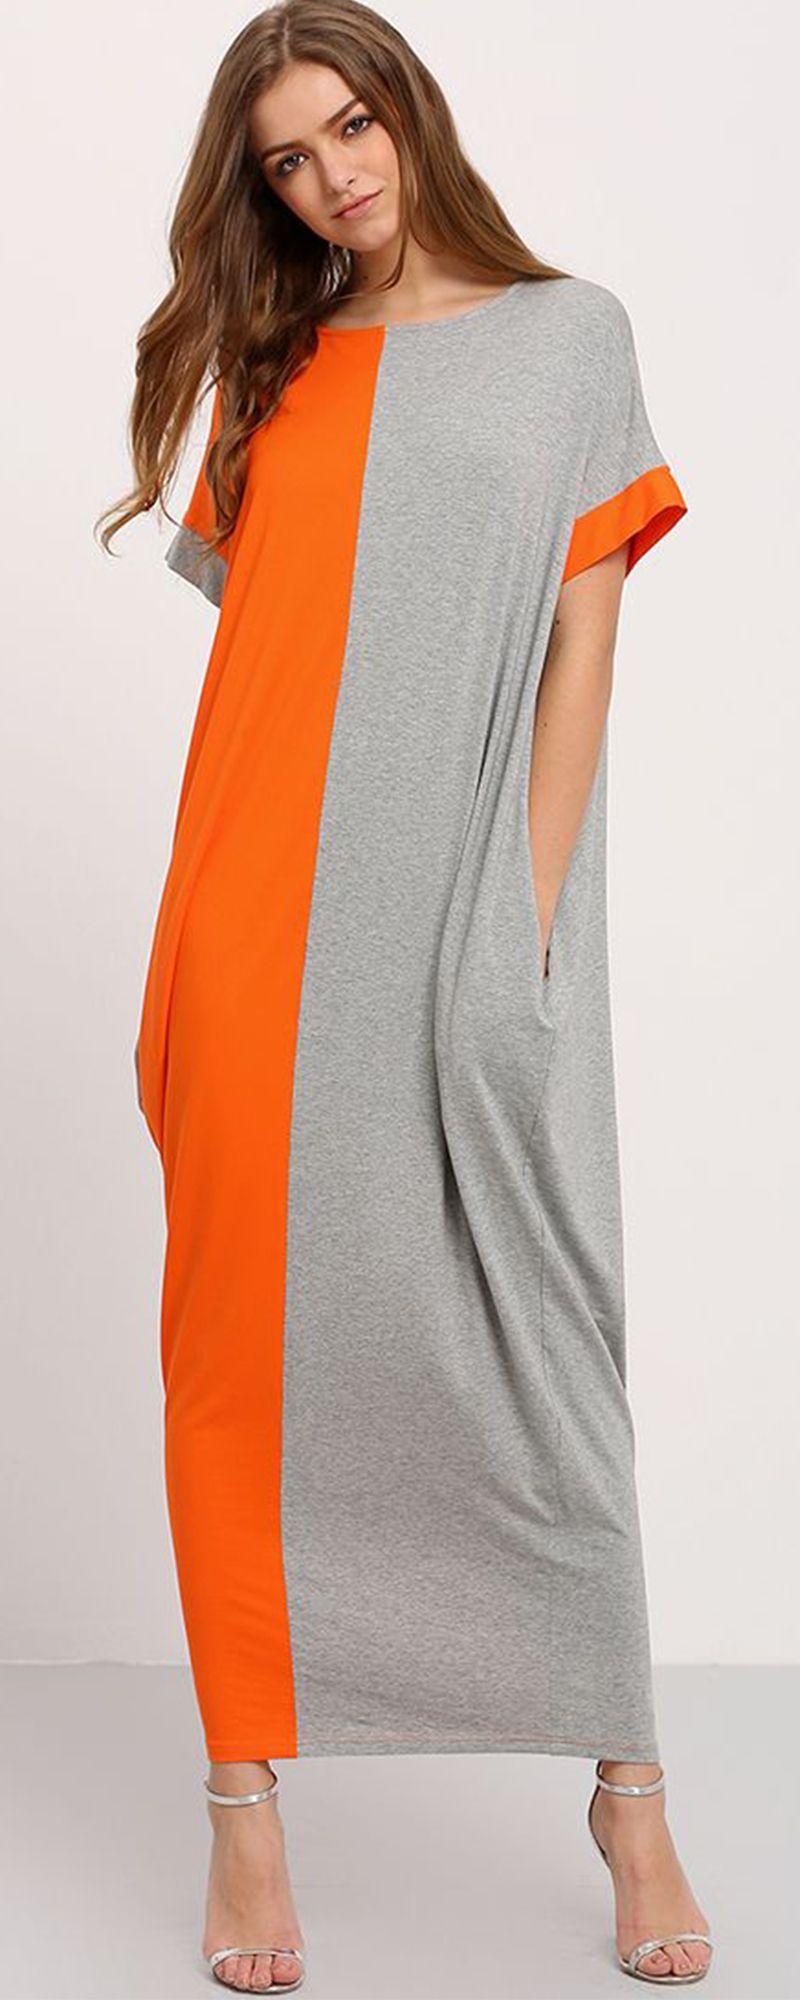 Grey orange contrast pockets maxi dress outfit pinterest maxi